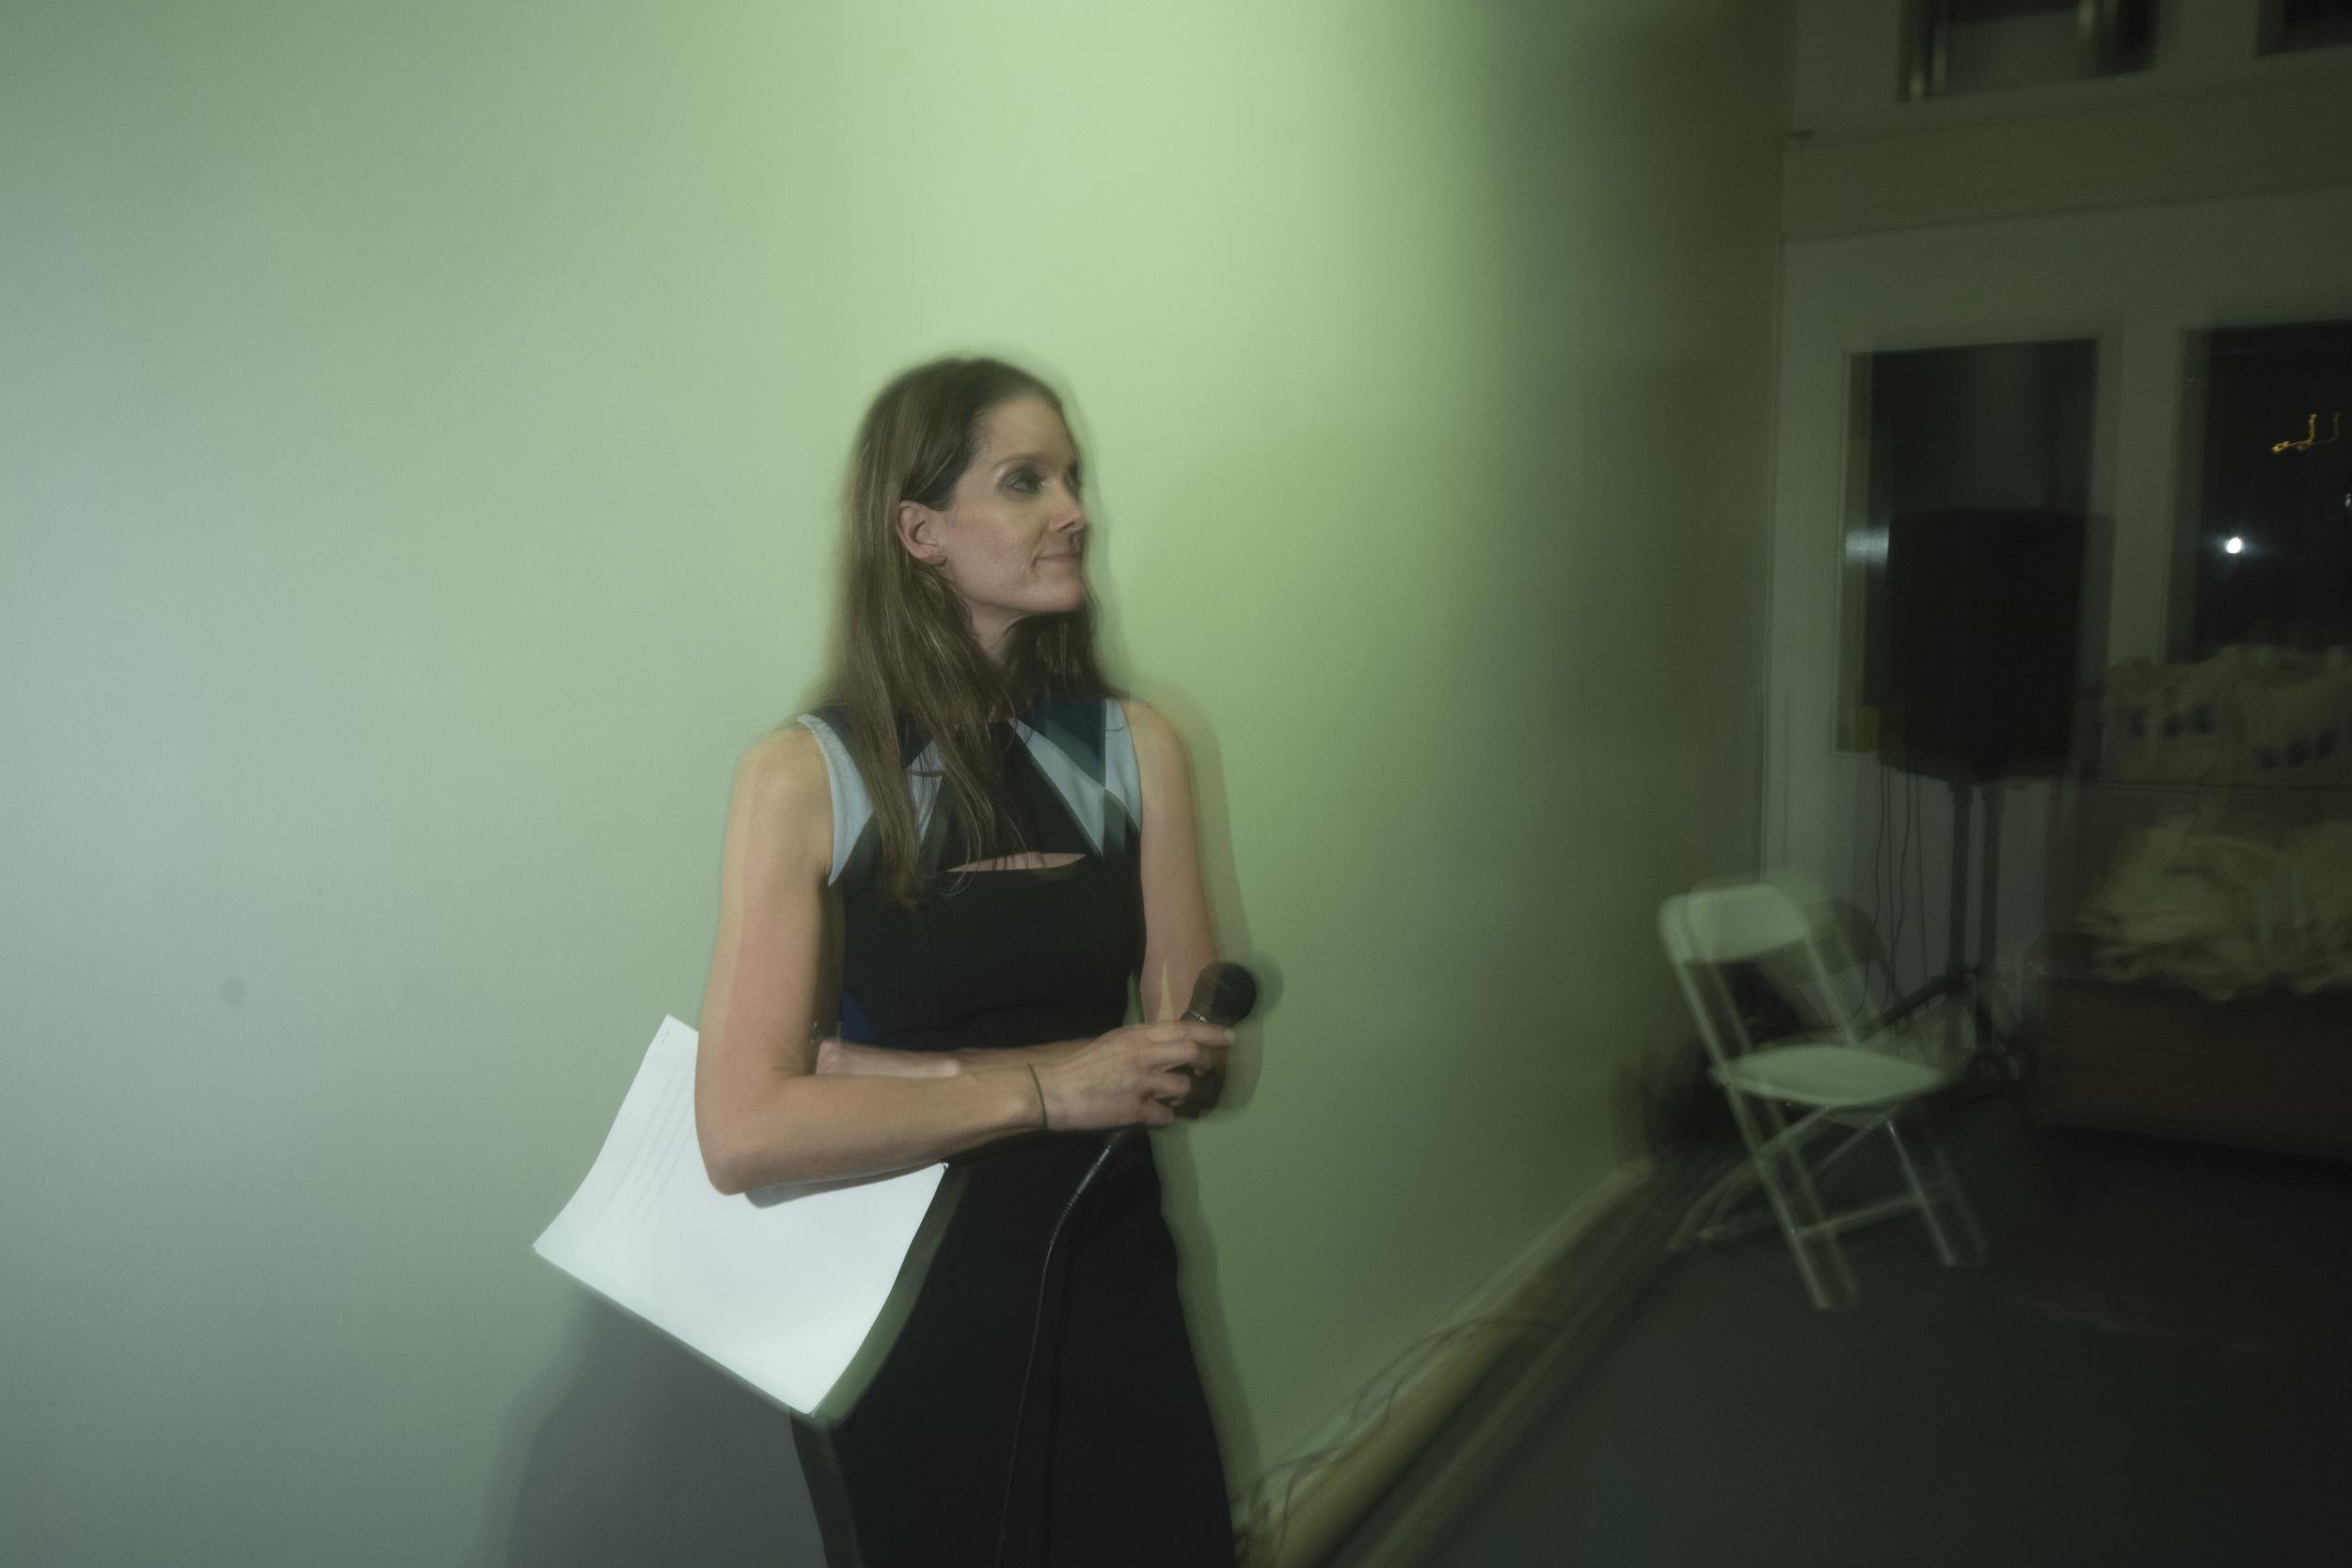 UNY founding editor Nicki Pombier Berger